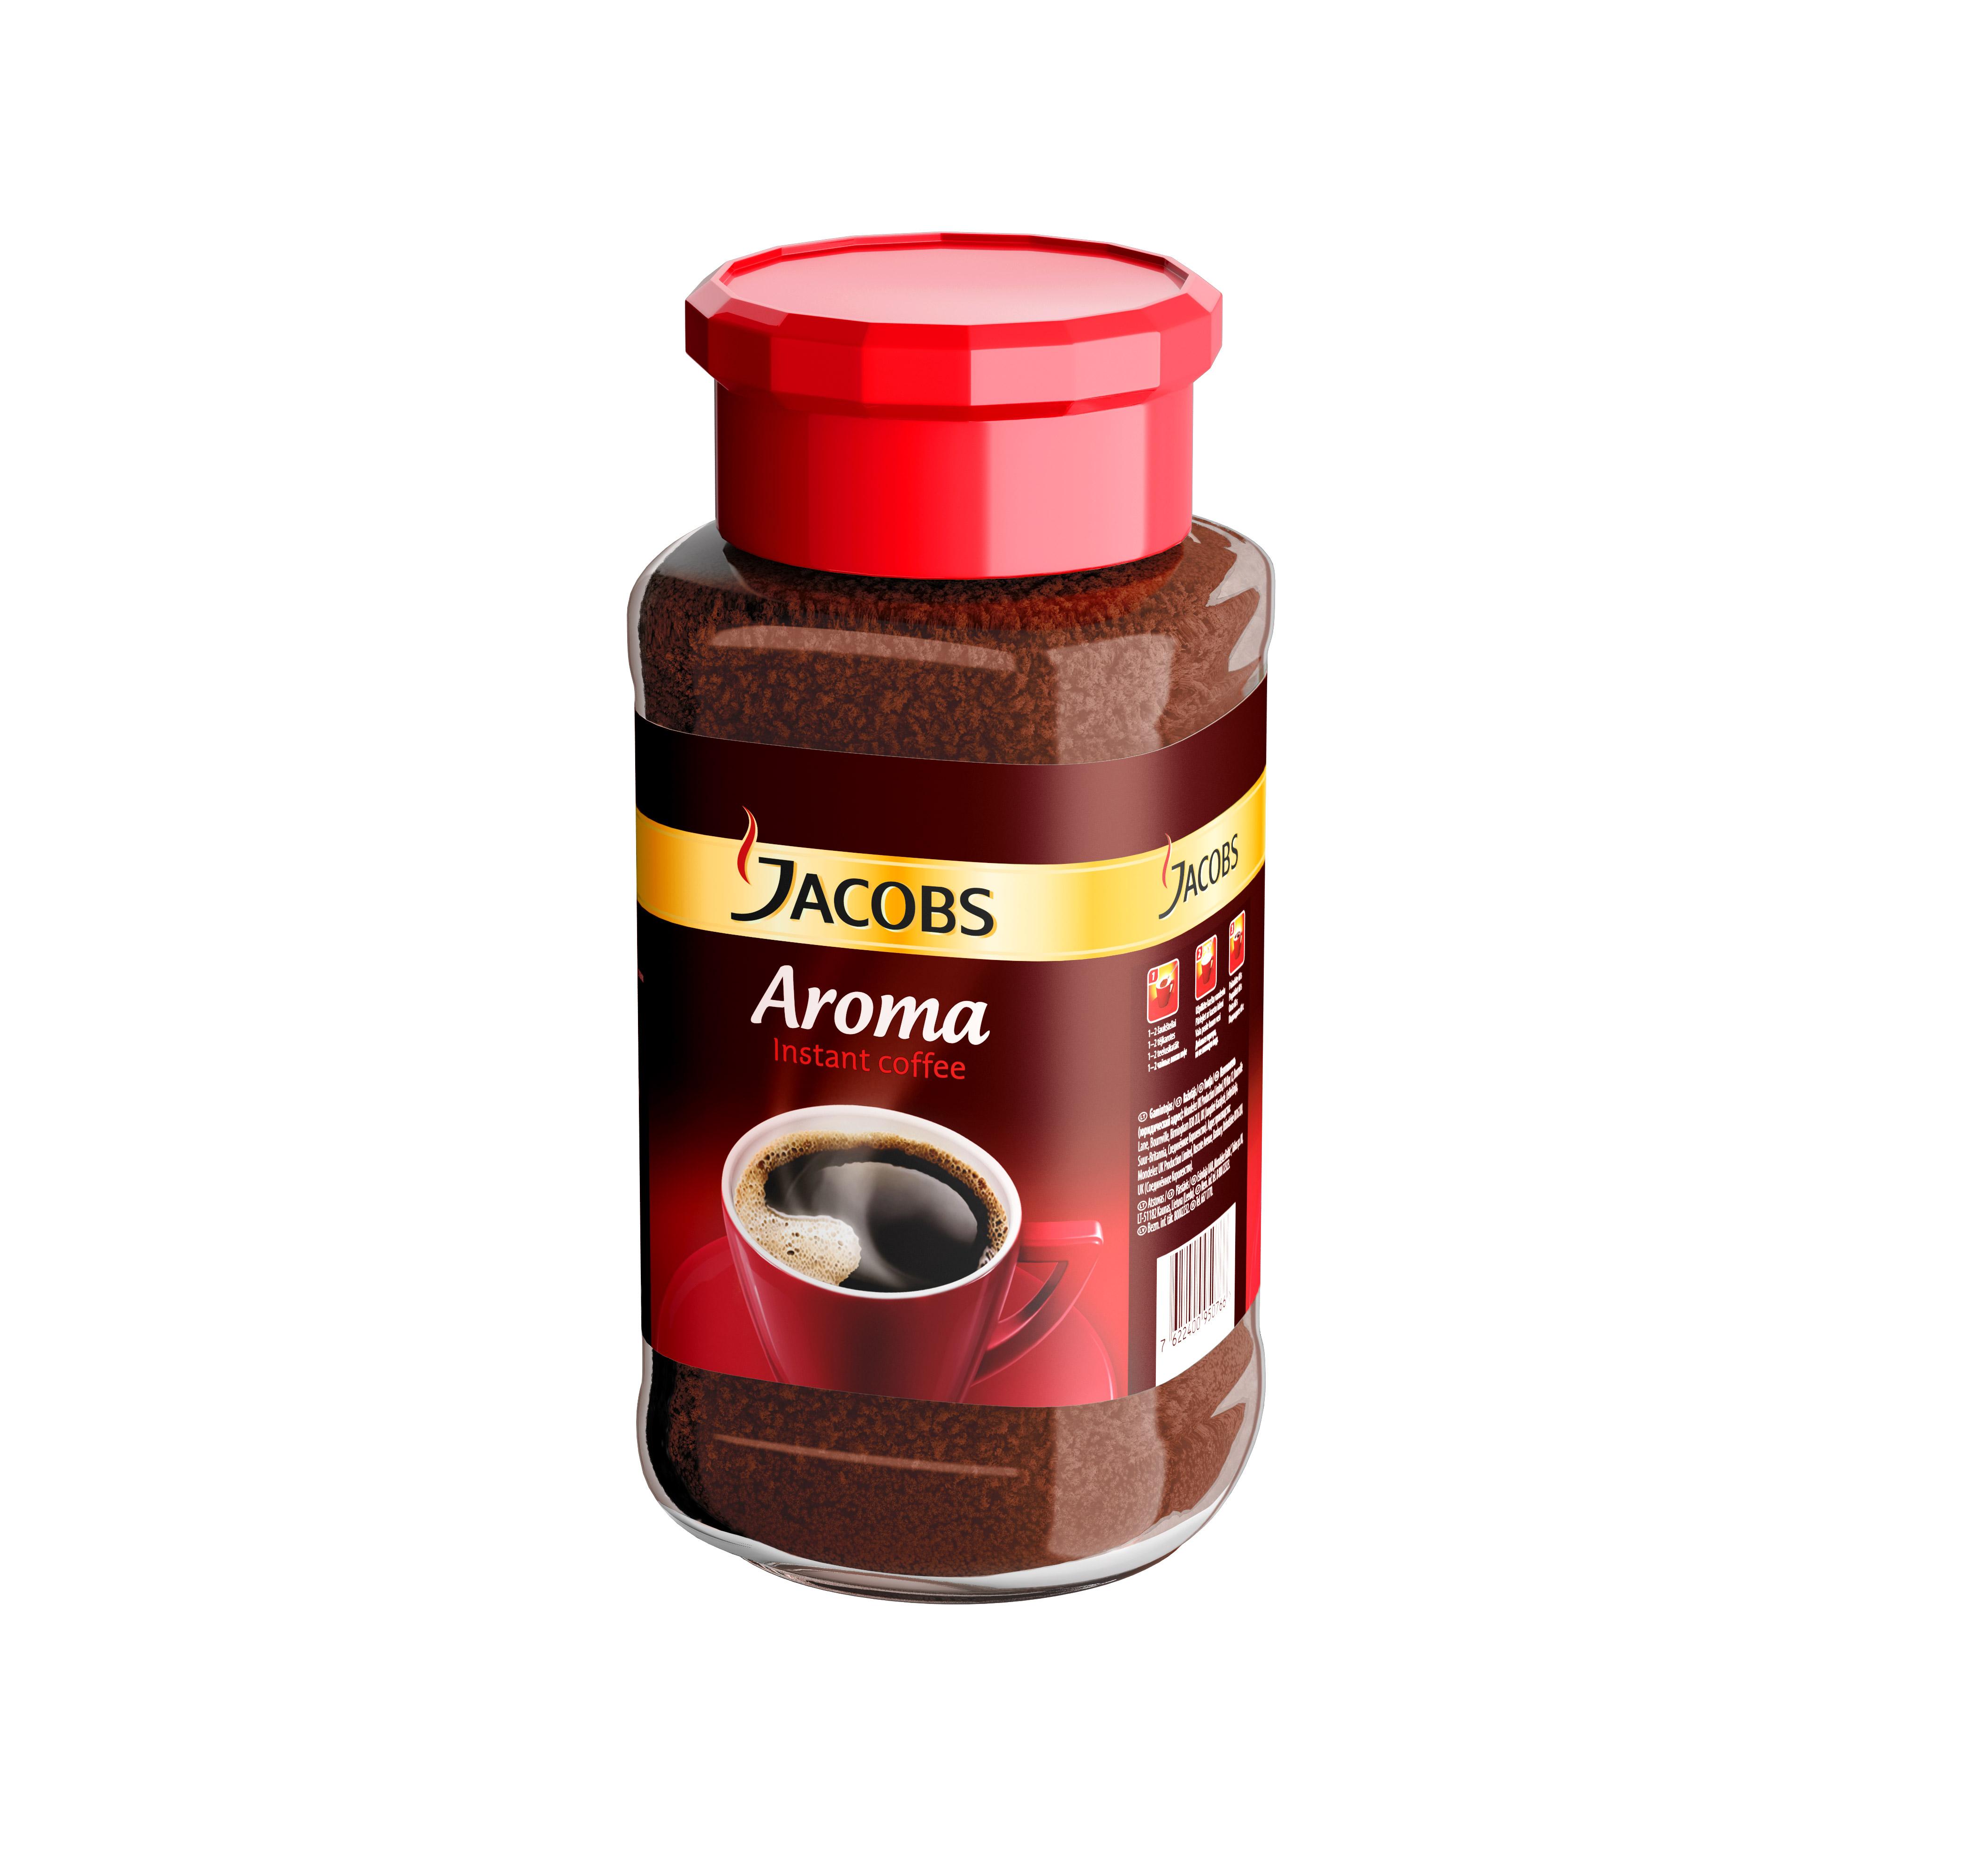 Tirpioji kava JACOBS AROMA, 100 g